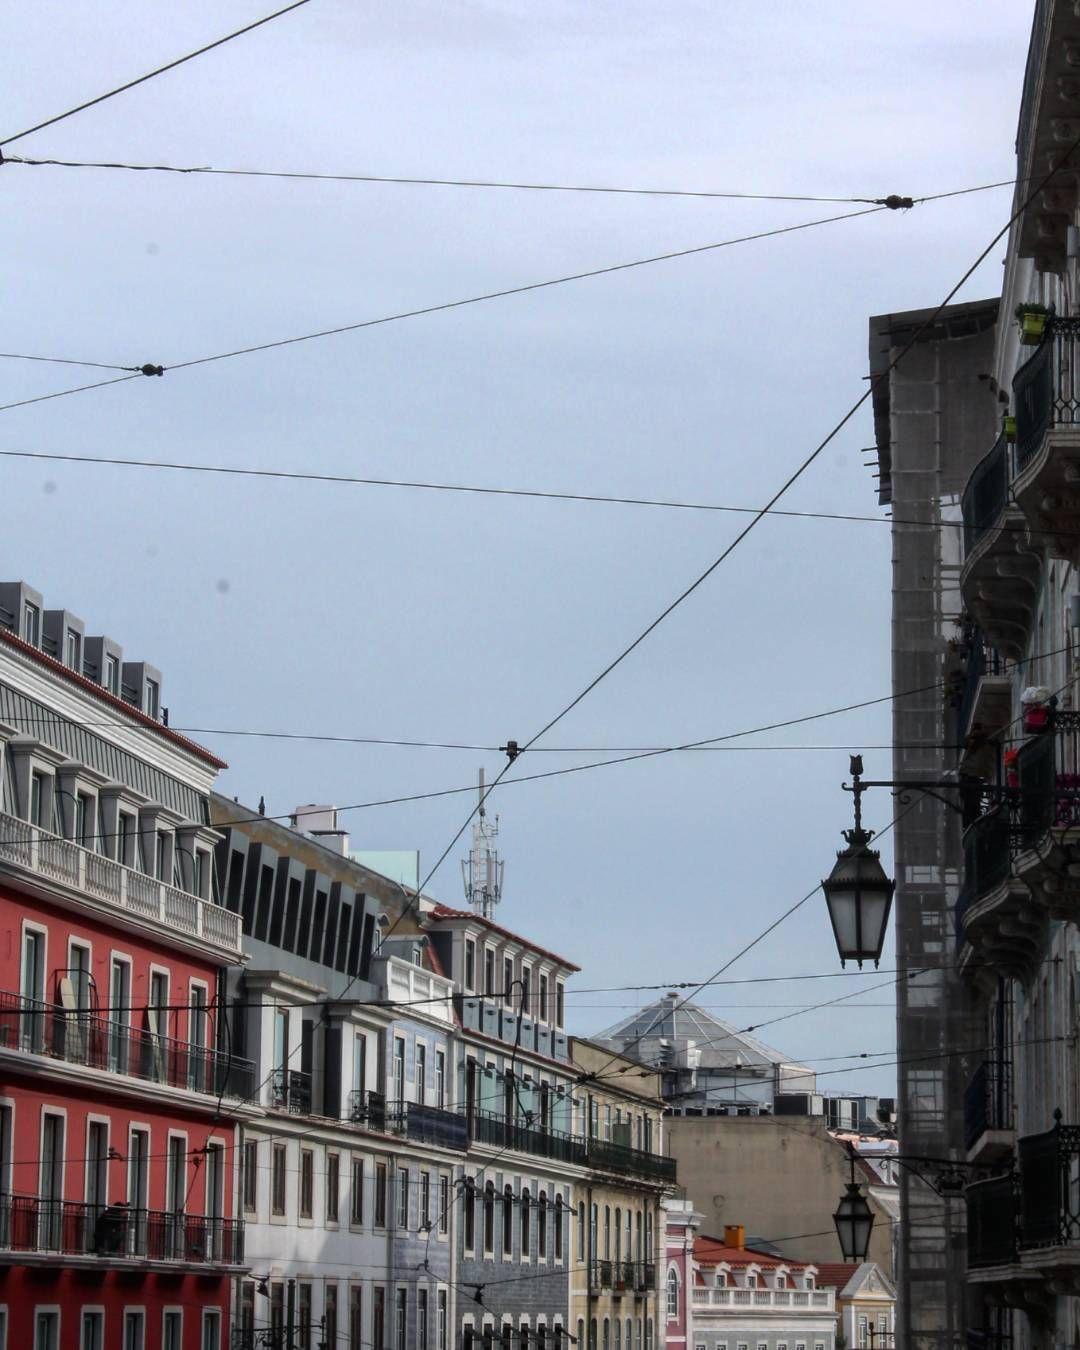 As suas casas de várias cores #portugalsemefeitos #streetview #takeoverinspiration #buildings #lisboa #city #morning #portugal #lisbon #sky #lines #igers #bella #amar_lisboa #p3top #capital #architecture #pt #design #outside #igersportugal #digital #blueday #landscape #lisbonne #hot_shotz by marta.rsilva